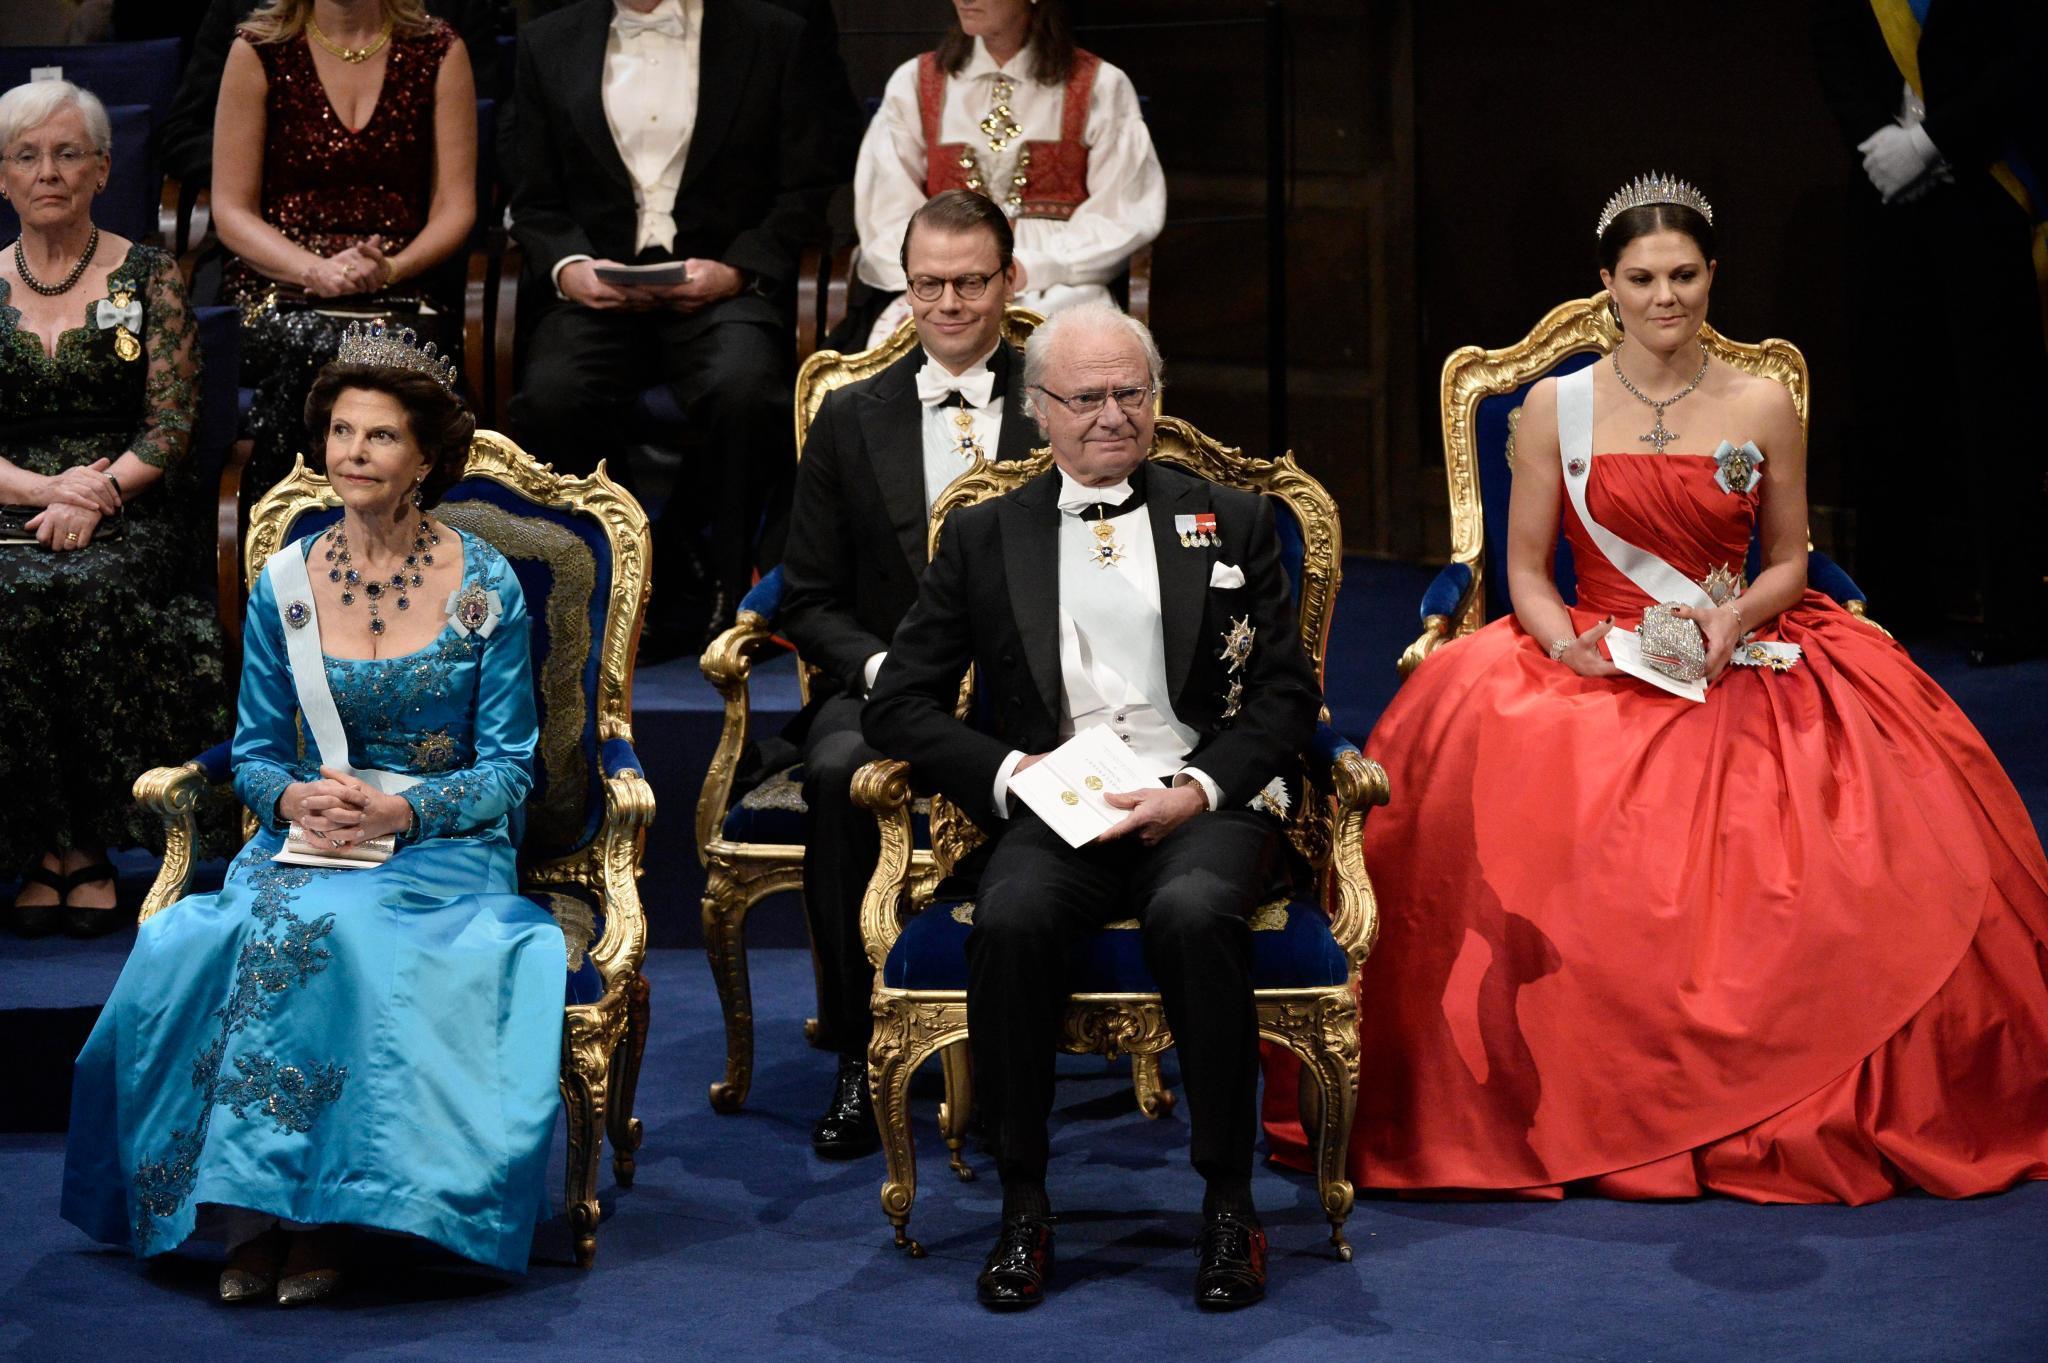 Königin Silvia, König Carl Gustaf, Prinz Daniel und Prinzessin Victoria